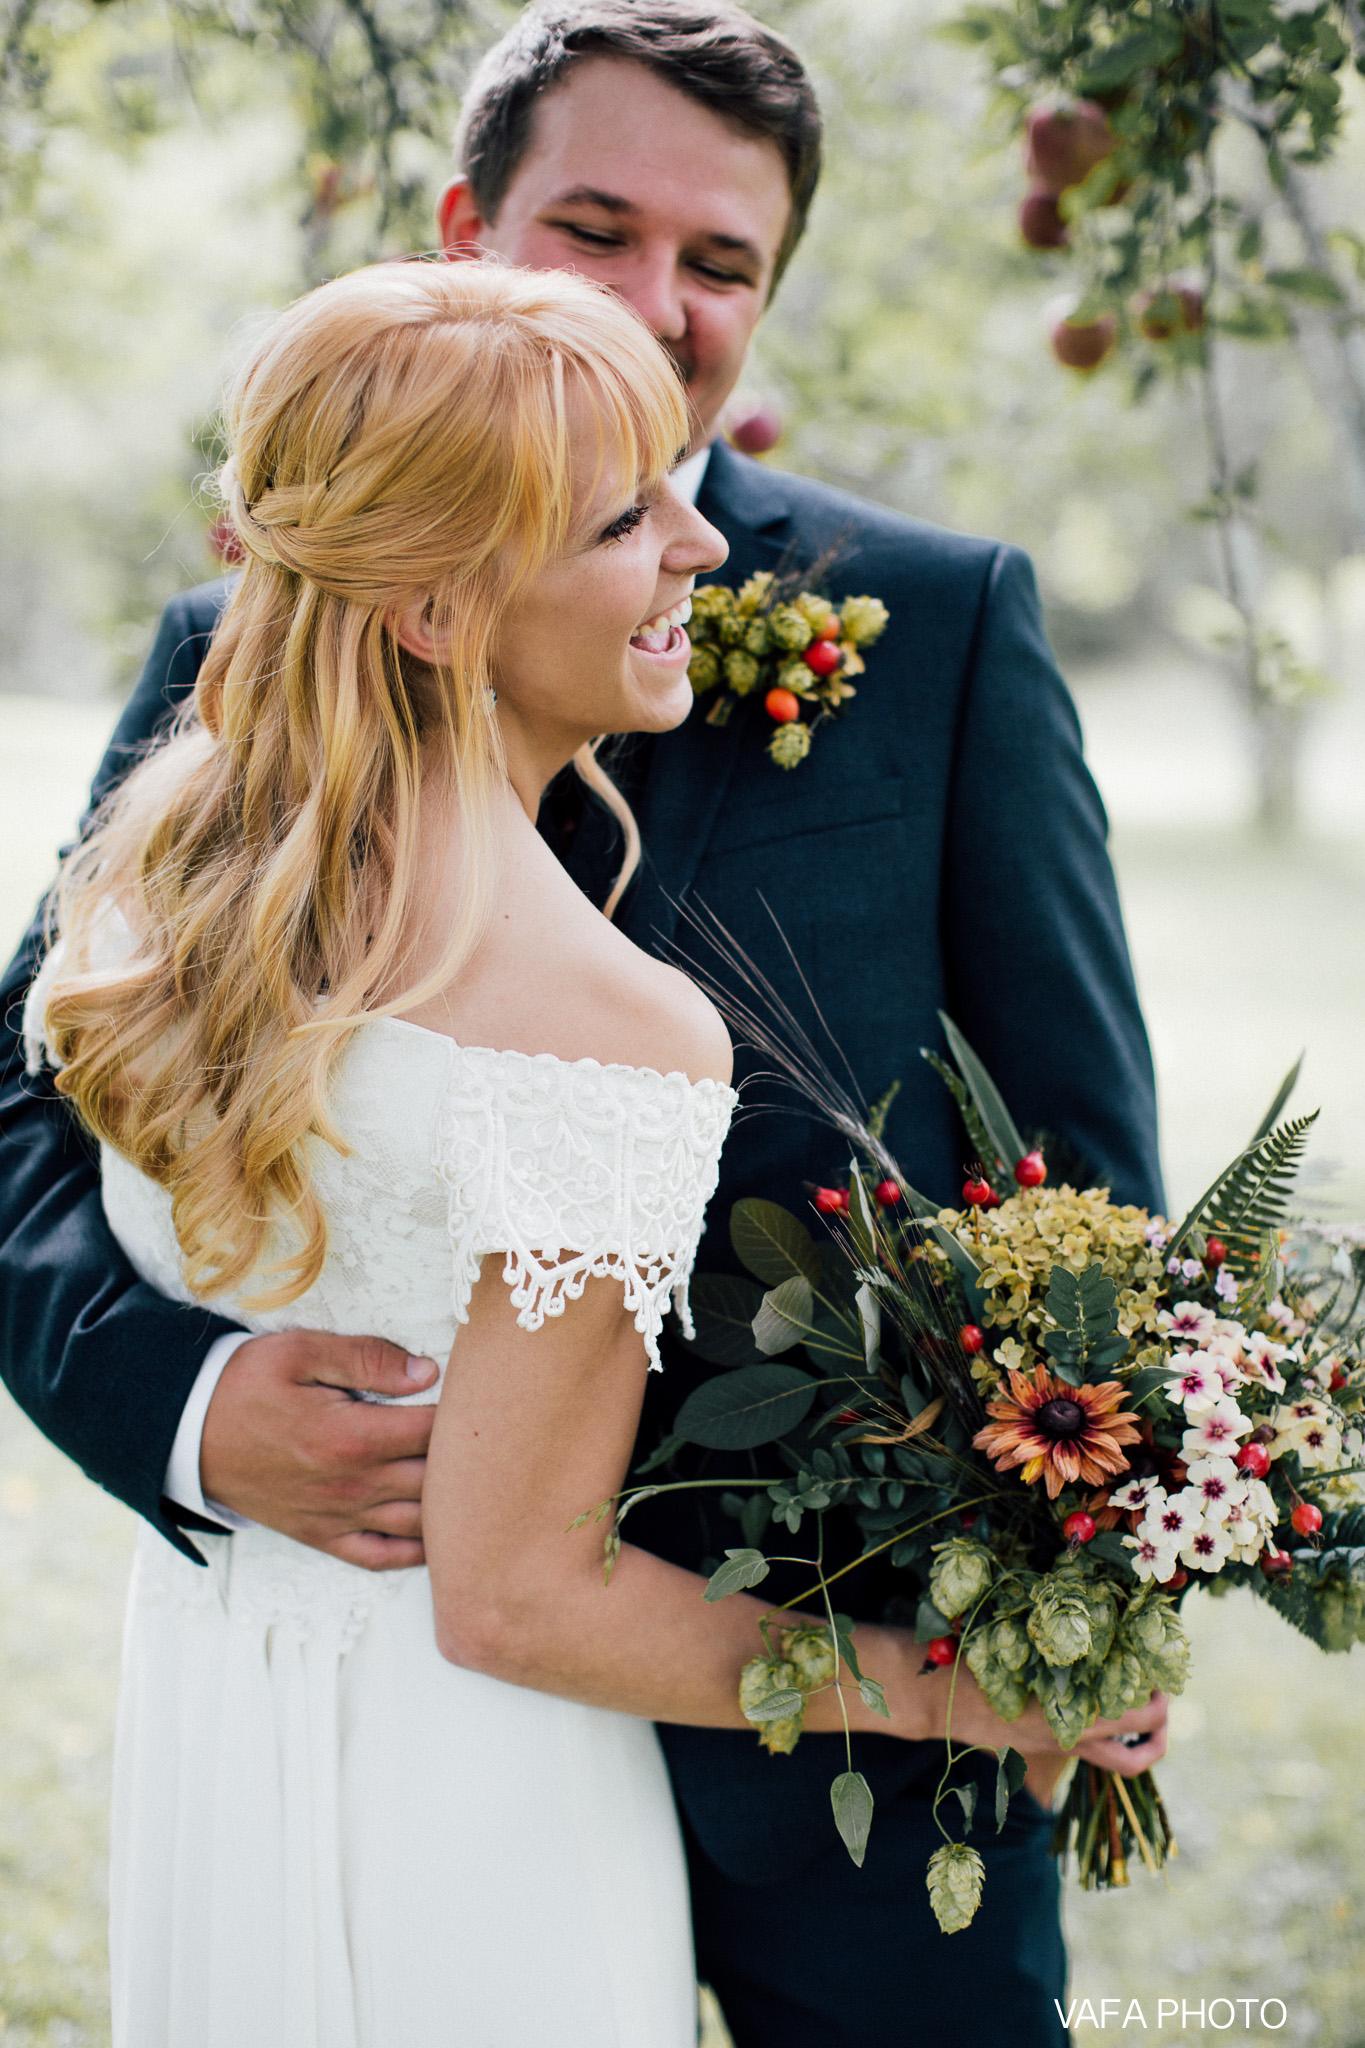 Belsolda-Farm-Wedding-Christy-Eric-Vafa-Photo-96.jpg